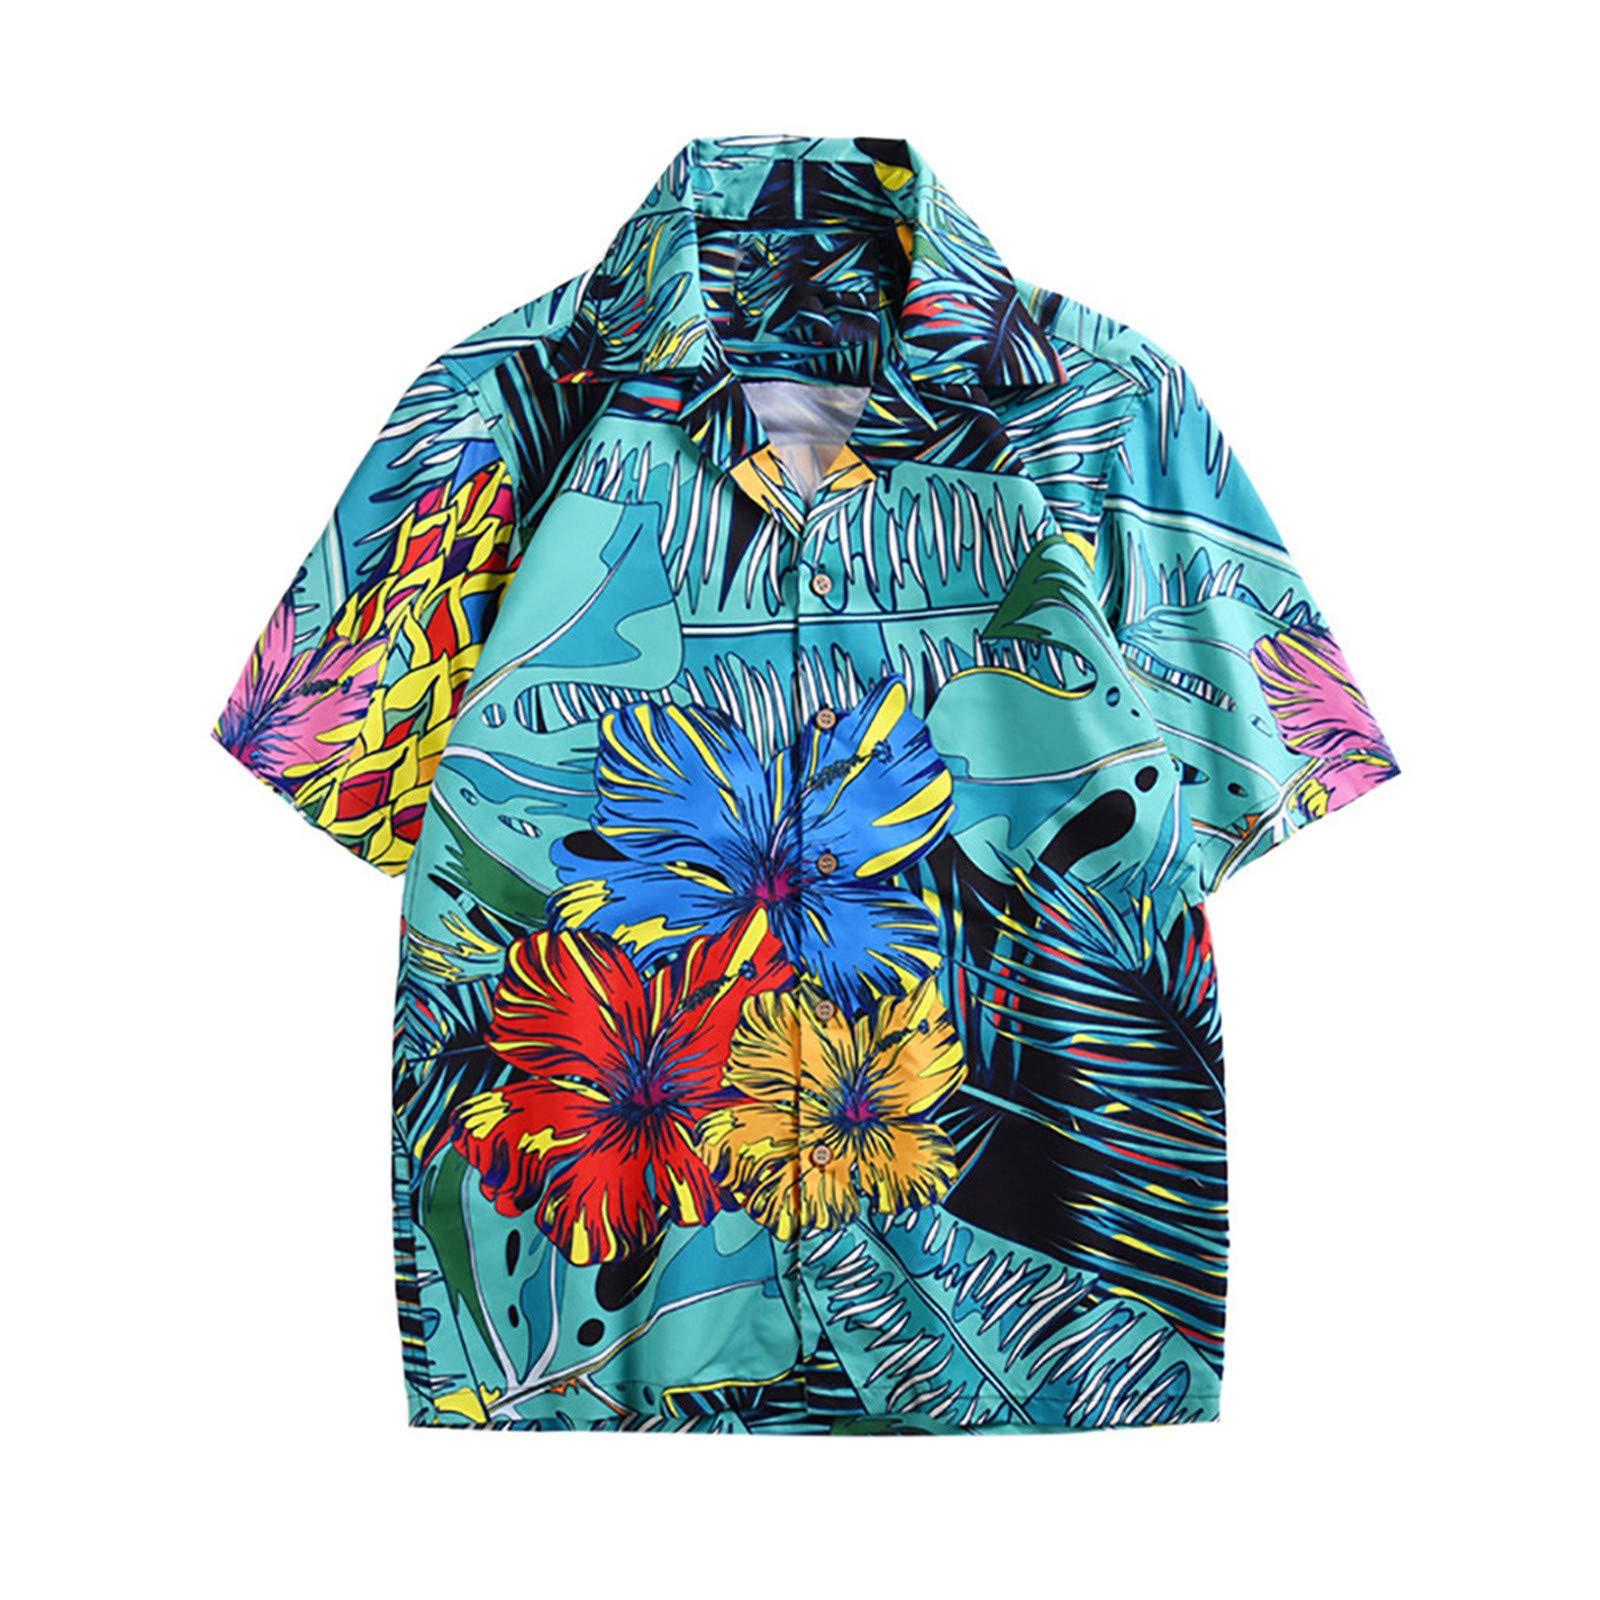 BAOHOKE Fashion Couple Personalized Print Beach Tops Short Sleeve (Green,2XL)